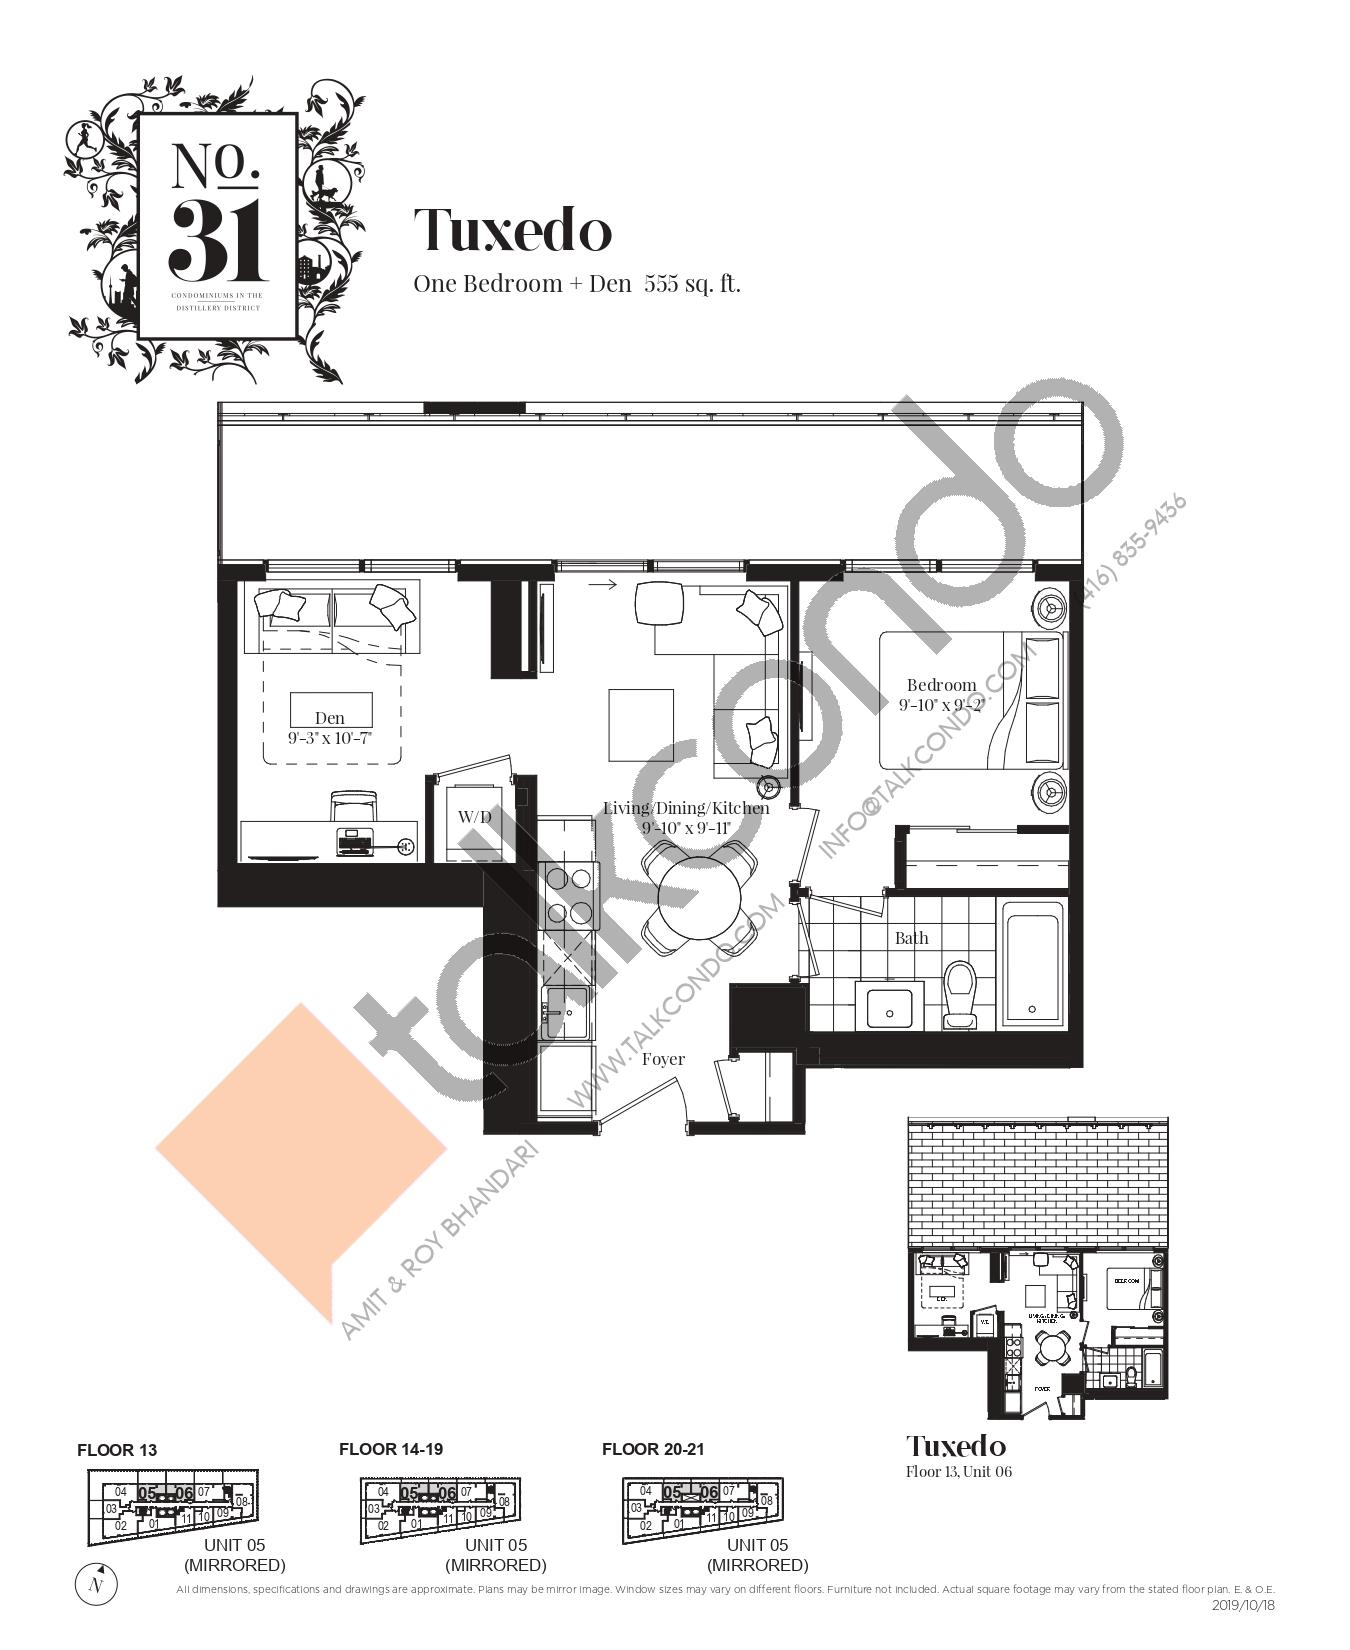 Tuxedo Floor Plan at No. 31 Condos - 555 sq.ft